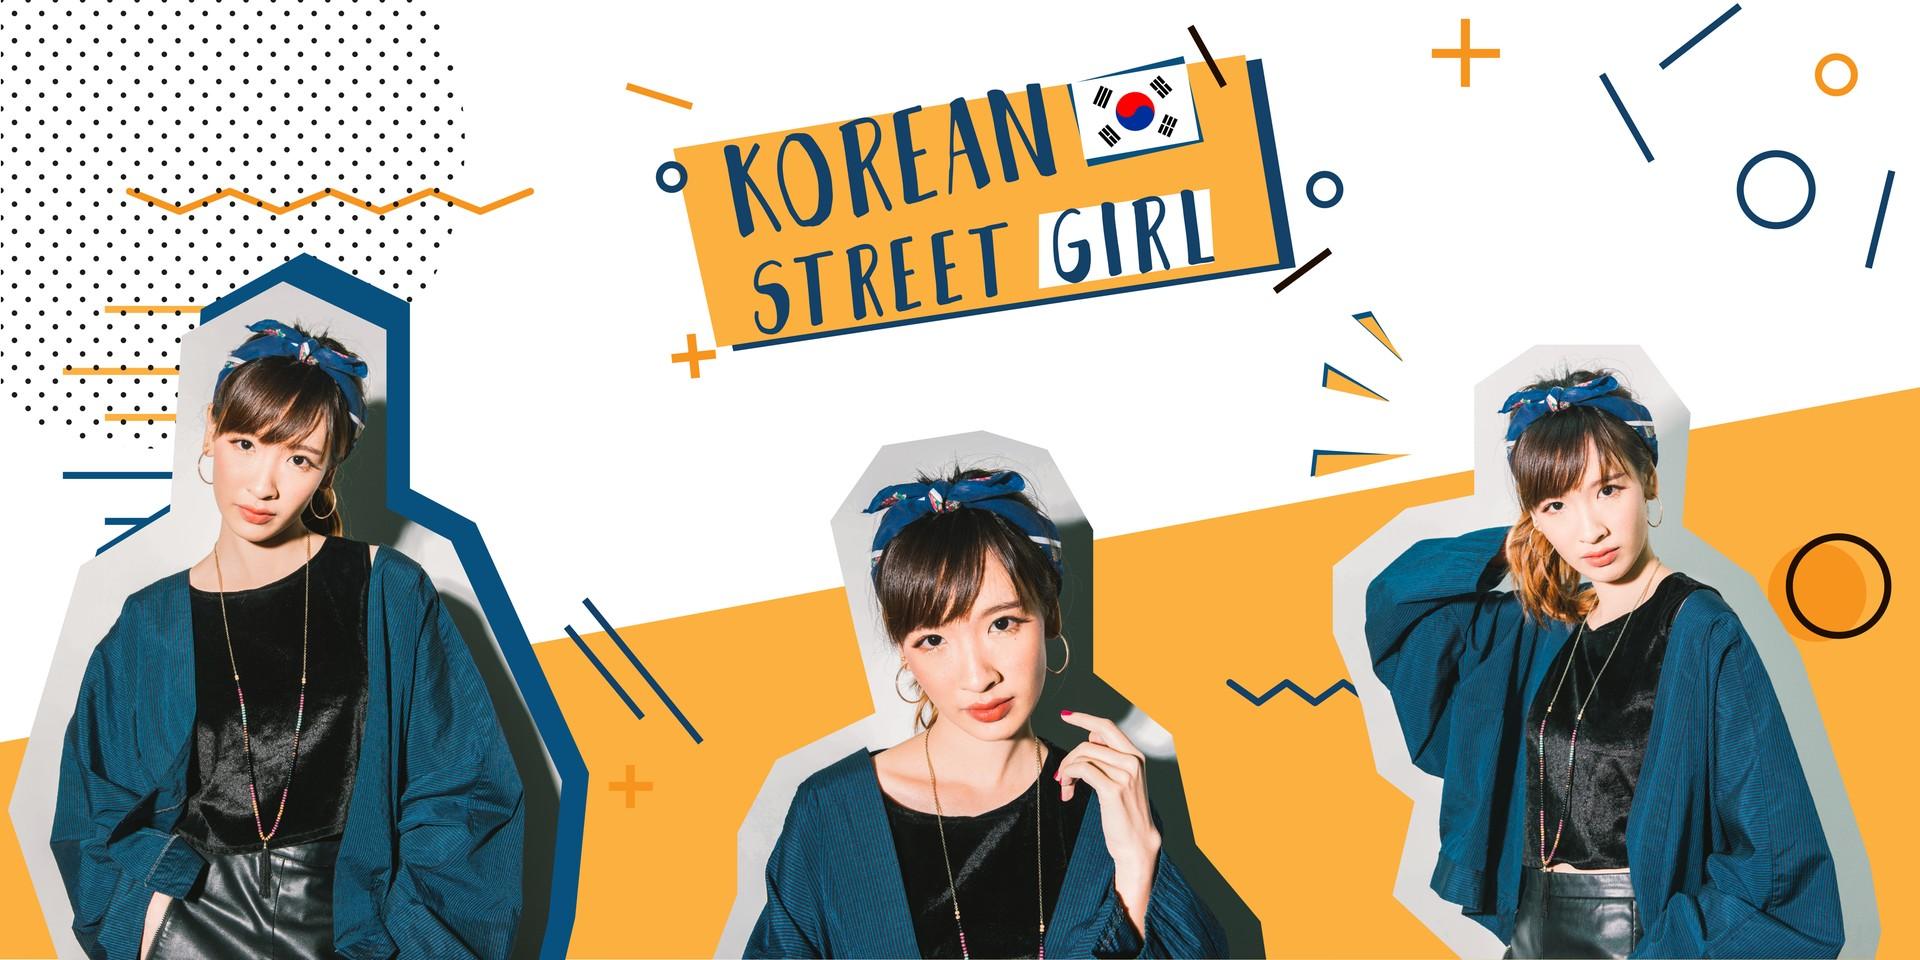 How to หน้าฉ่ำเงา โชว์ผิวใสเปลี่ยนลุคเป็นสาว Street เกาหลีสุดชิค